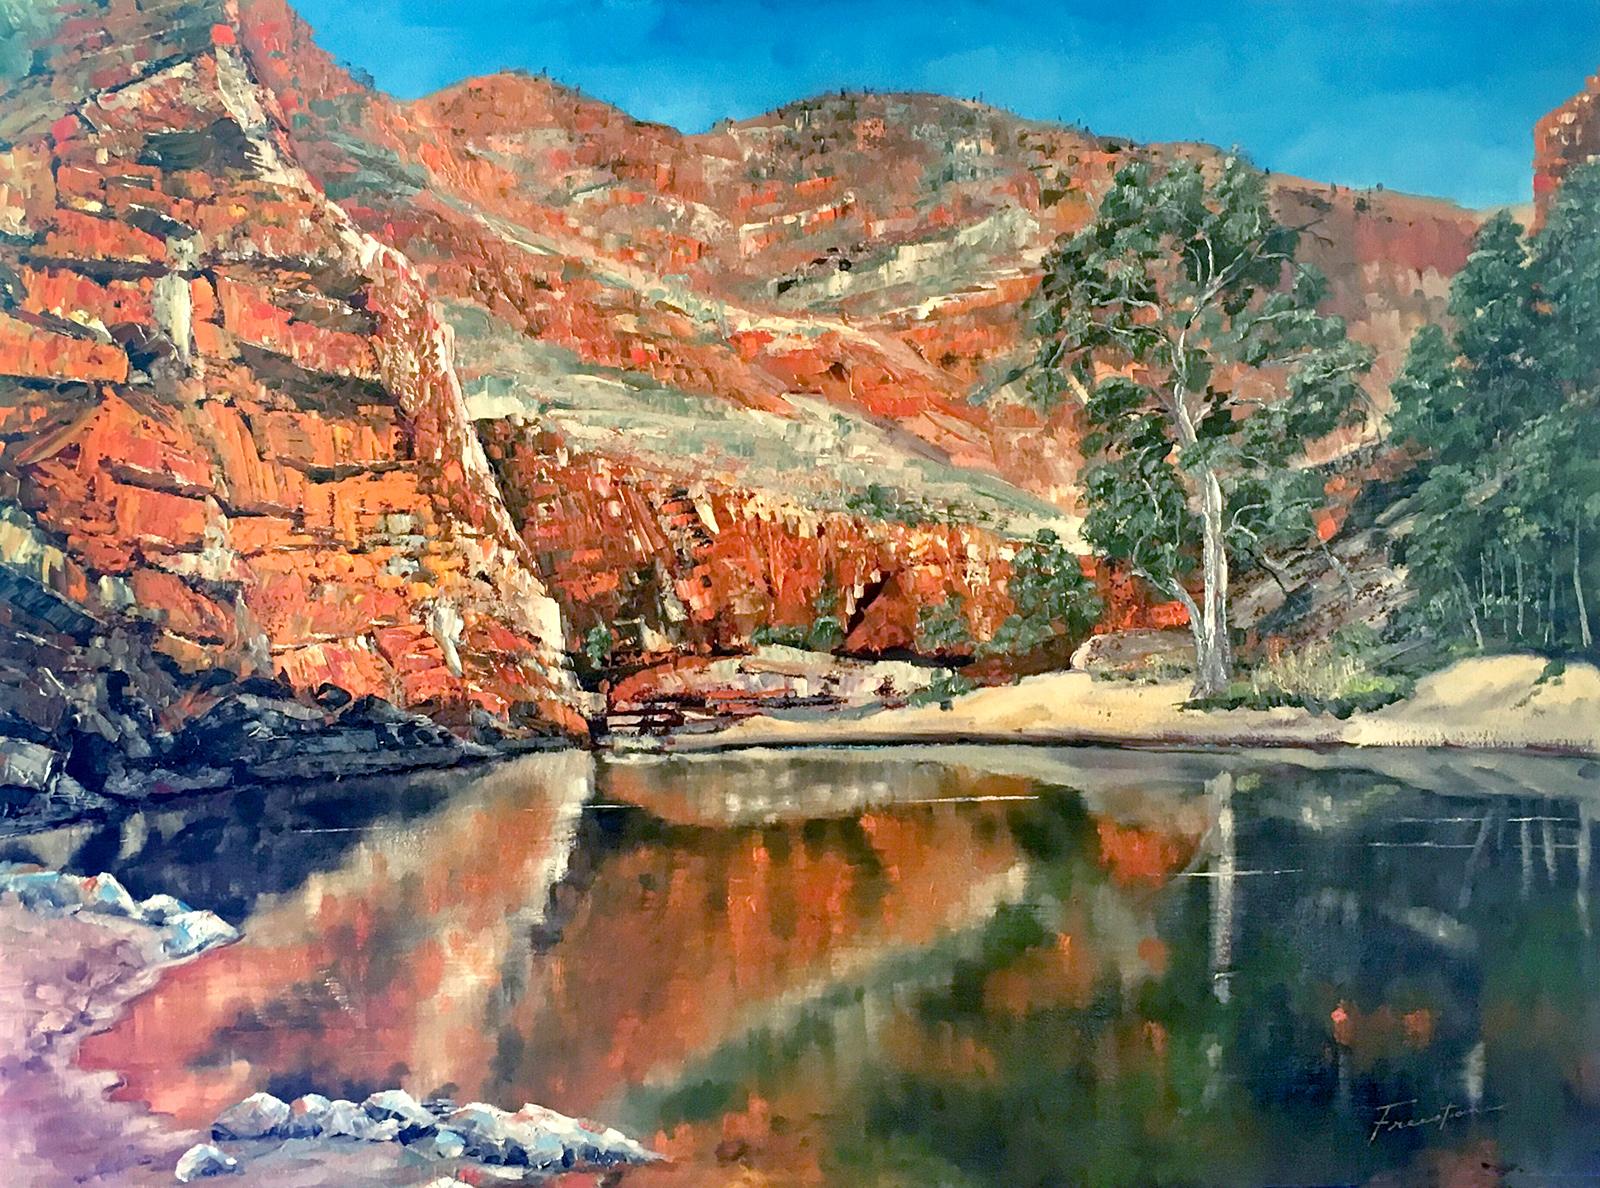 'The Billabong' Ormiston Gorge II